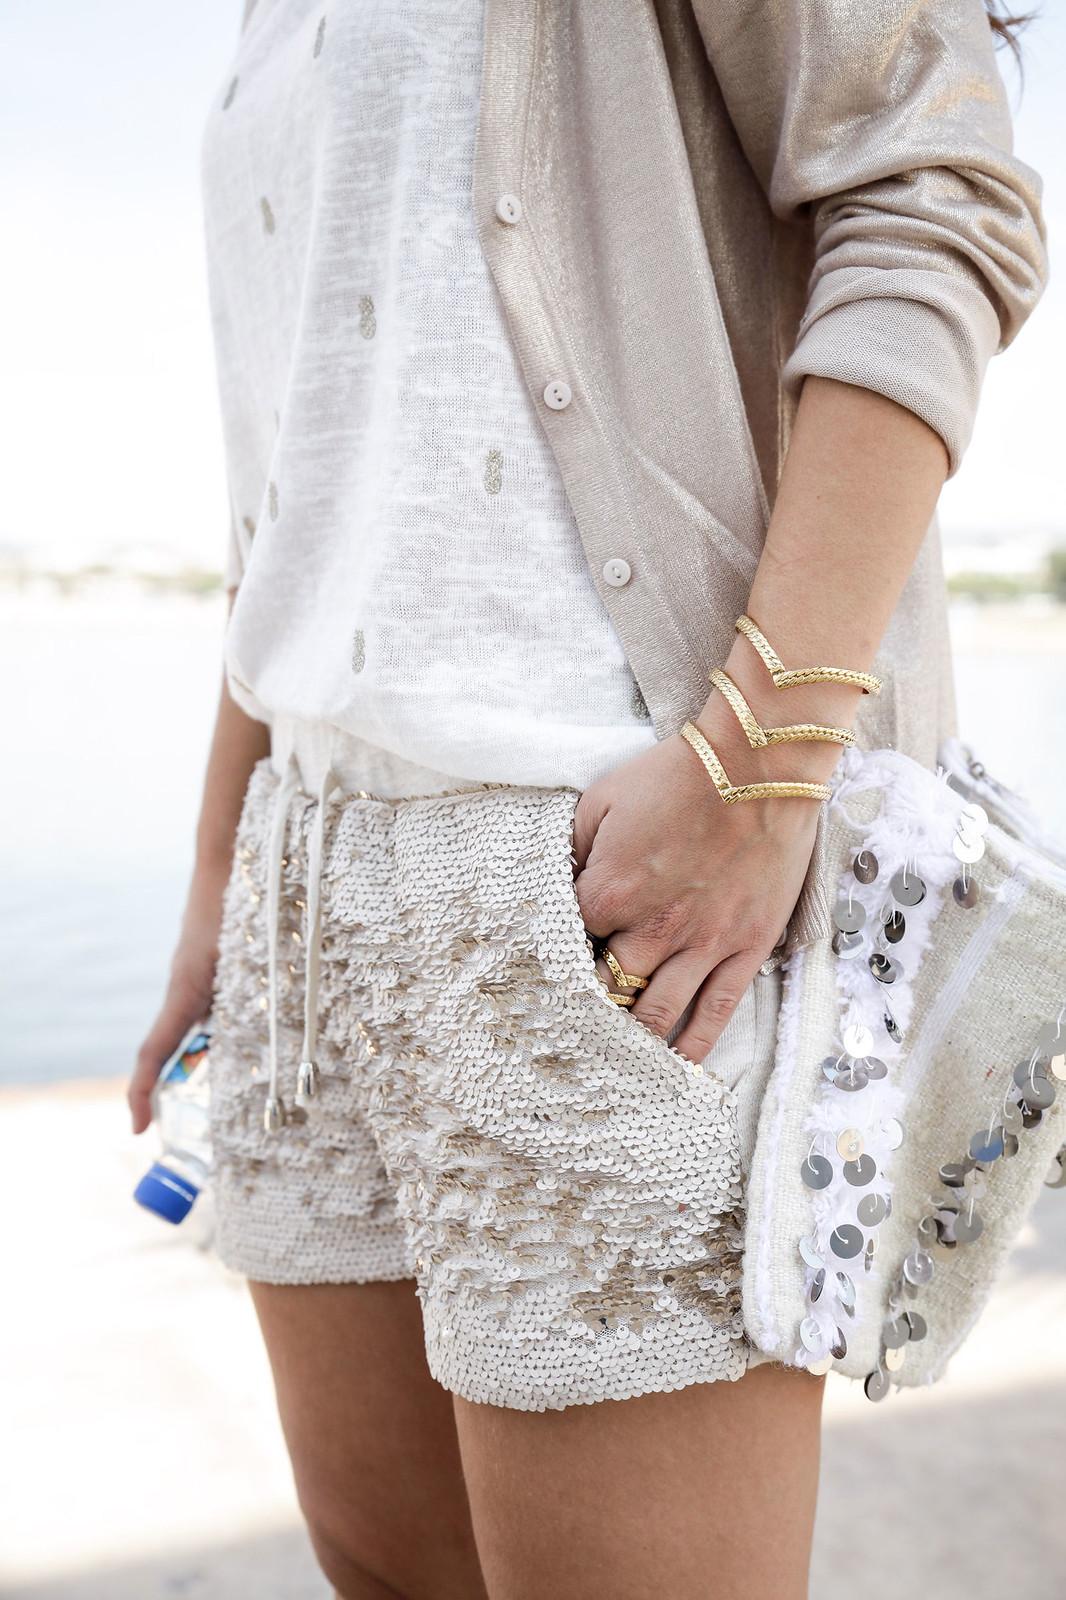 08_Shorts_lentejuelas_dorados_outfit_lelyjane_gold_shorts_theguetsgirl_laura_santolaria_influencer_barcelona_style